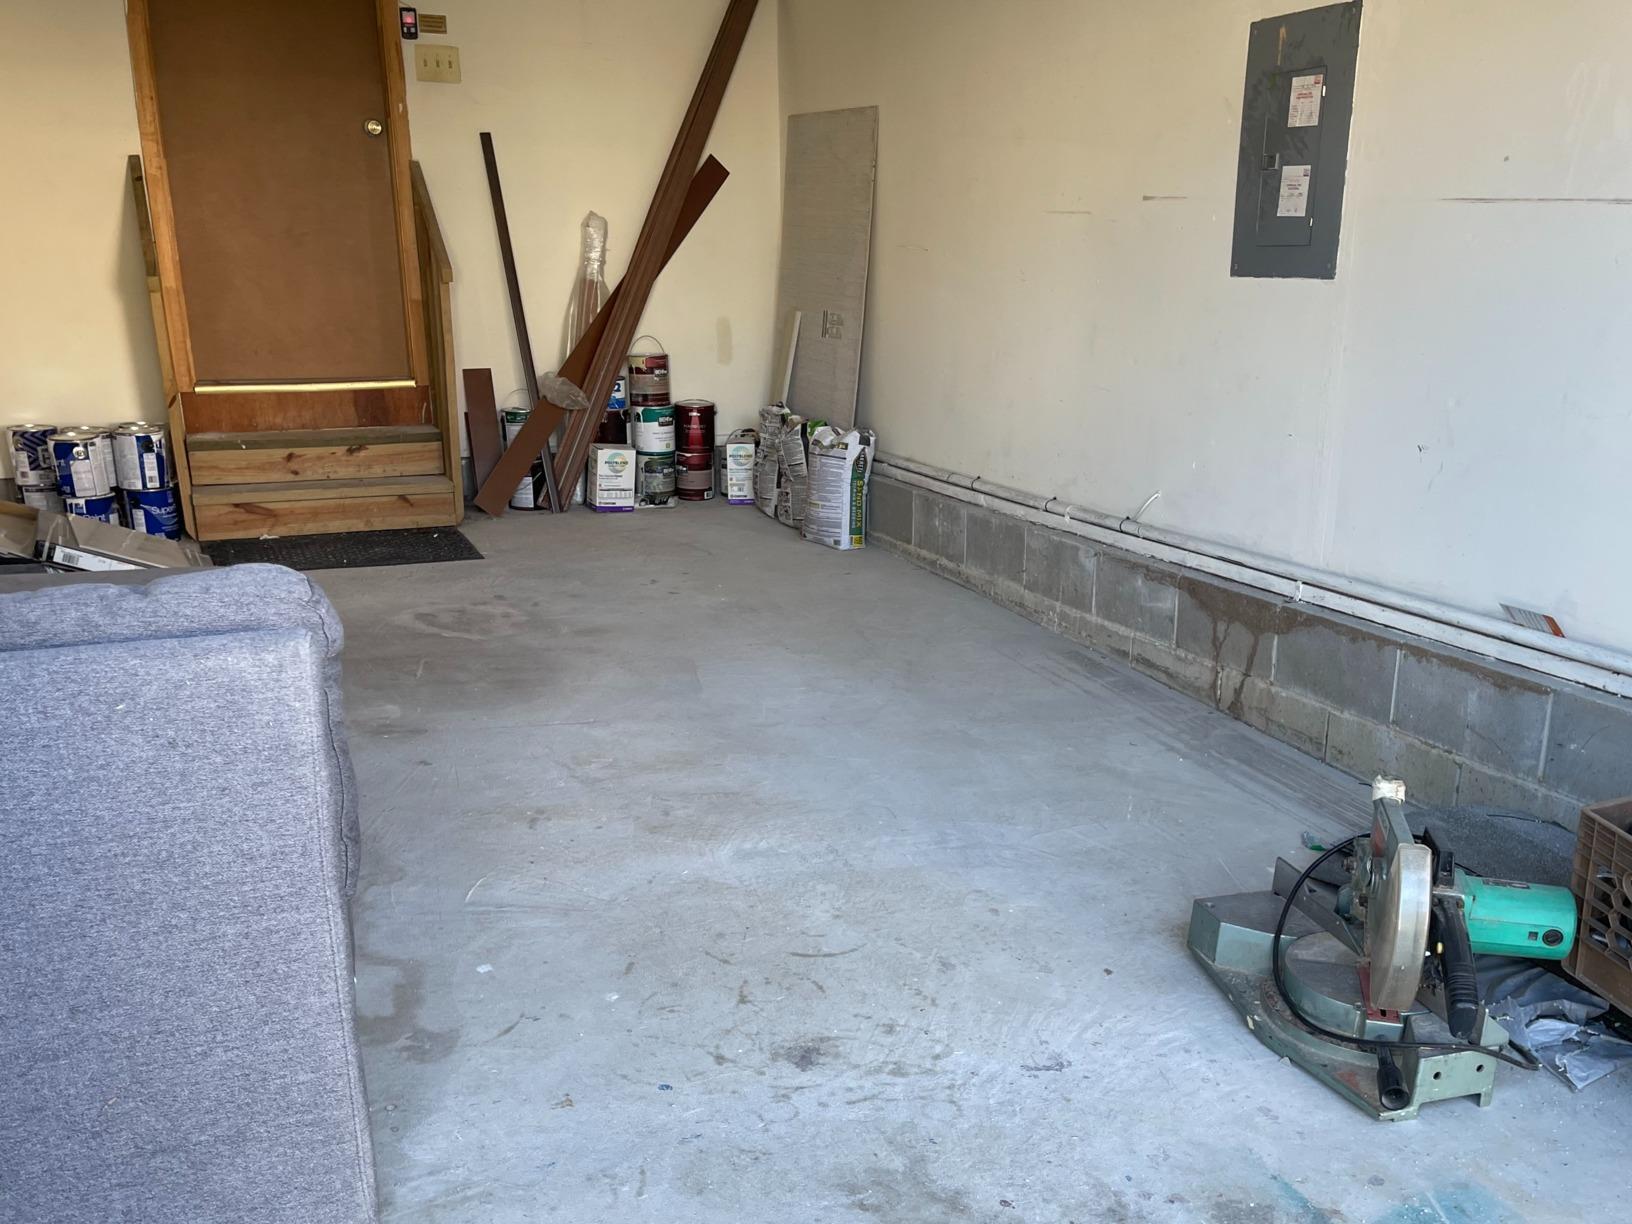 Bayville, NJ Garage Cleanout - After Photo